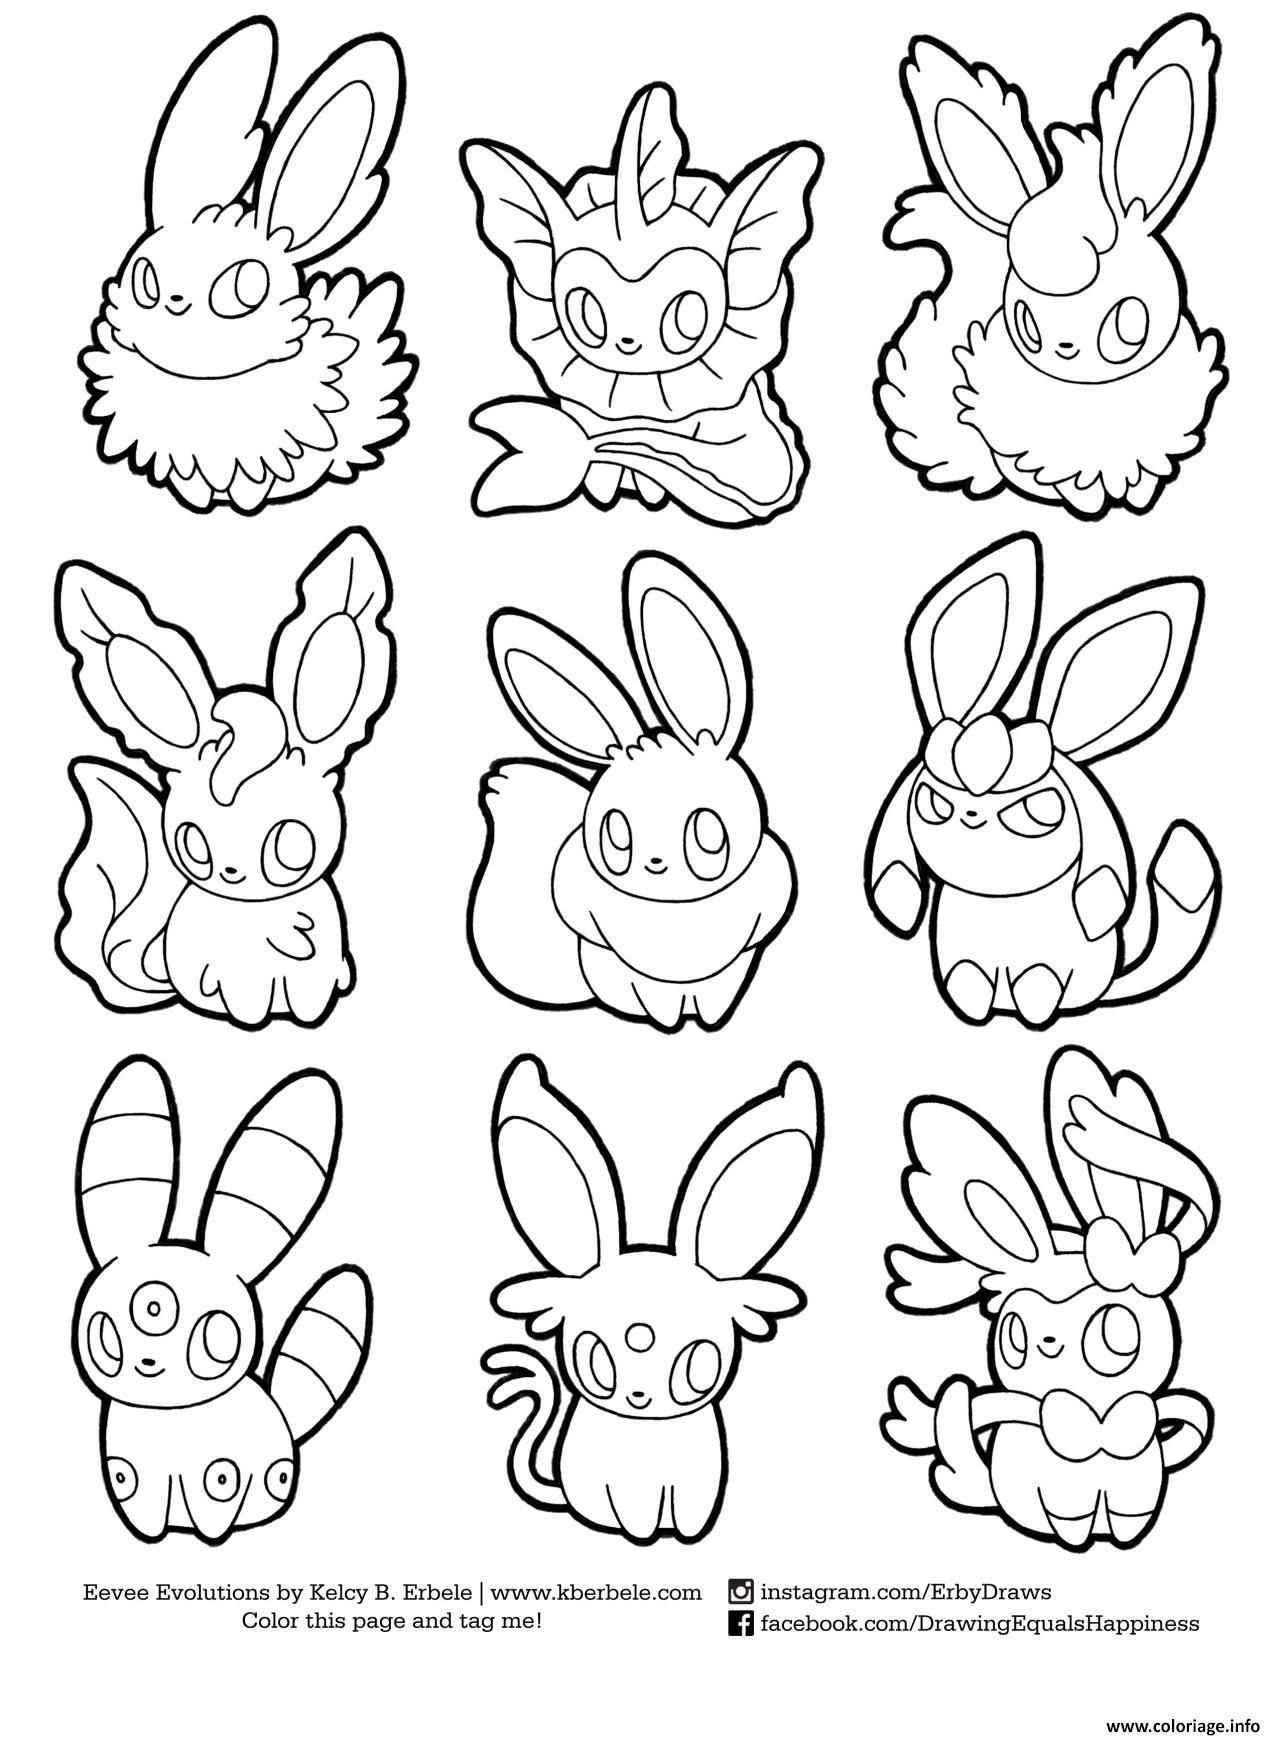 Coloring Pokemon Eevee Evolutions List Drawing Print Pokemon Ausmalbilder Pokemon Zum Ausmalen Ausmalbilder